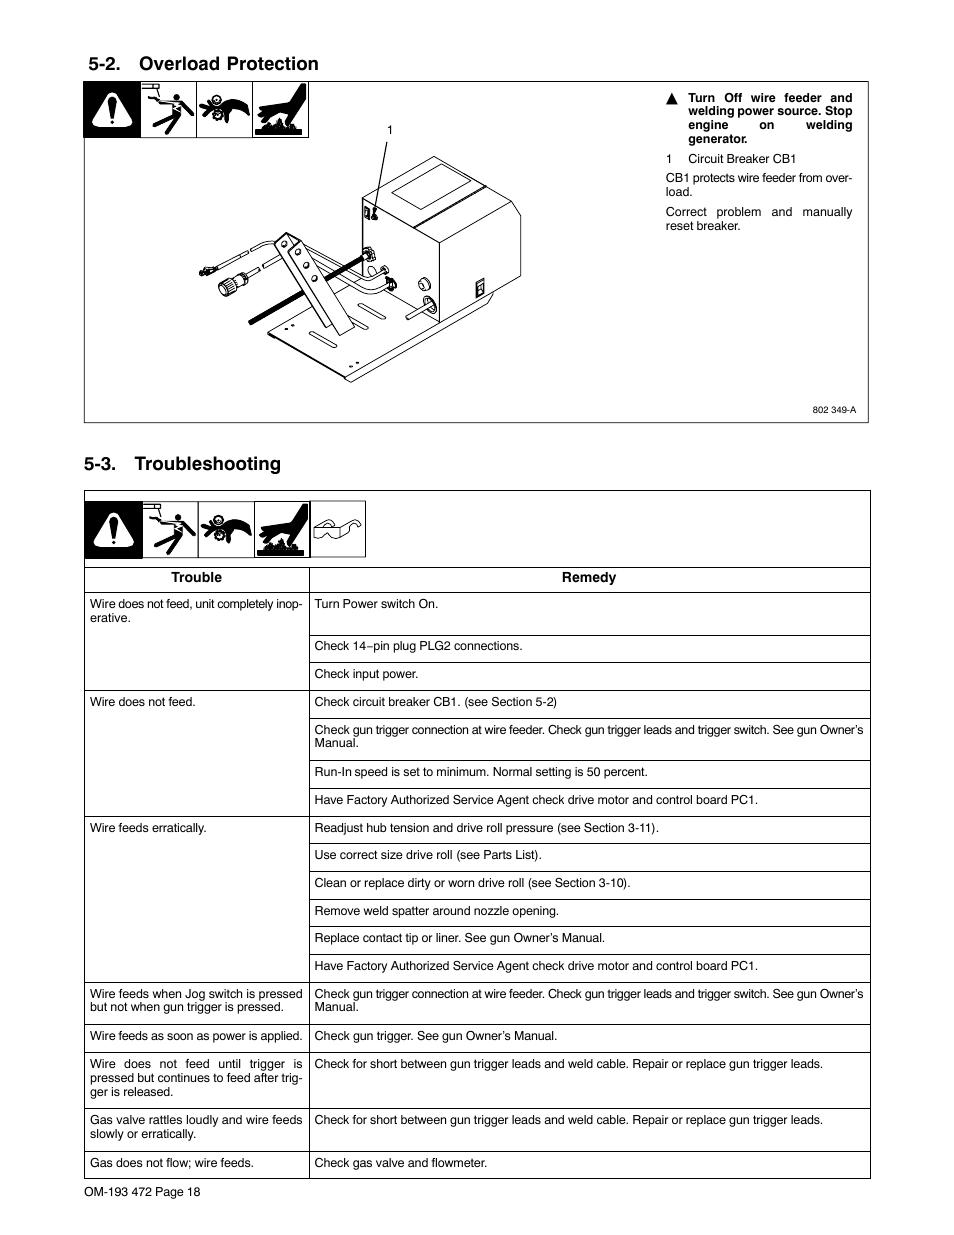 hight resolution of miller 350p wiring diagram 4k wiki wallpapers 2018 millermatic 350p review millermatic 350p wiring diagram